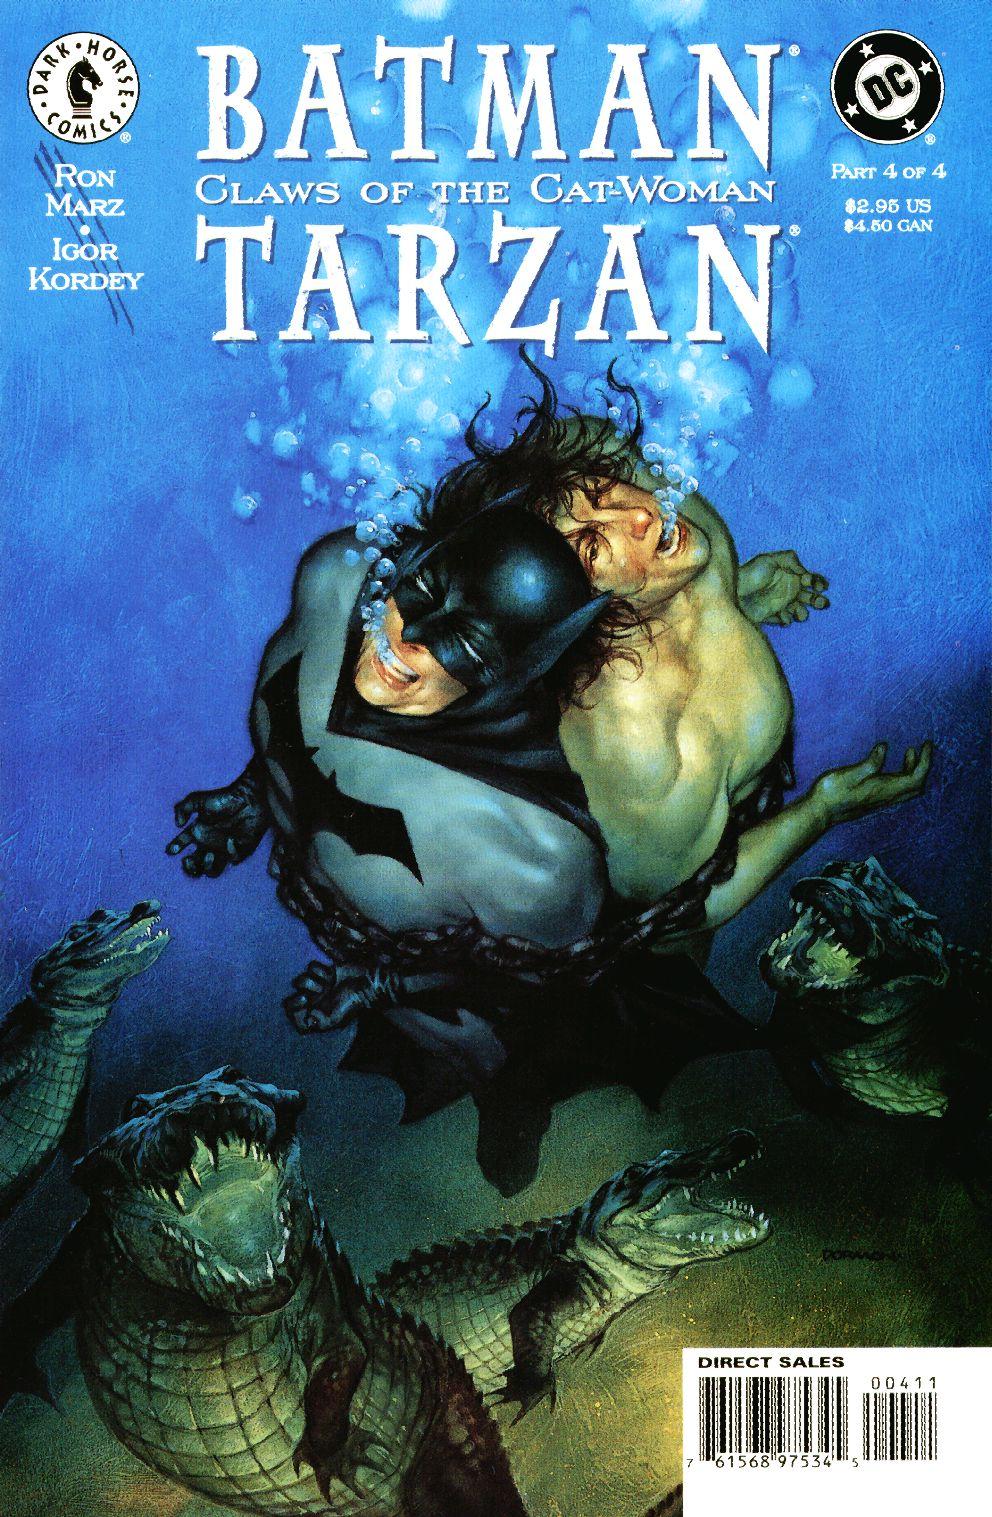 Batman/Tarzan: Claws of the Cat-Woman 4 Page 1